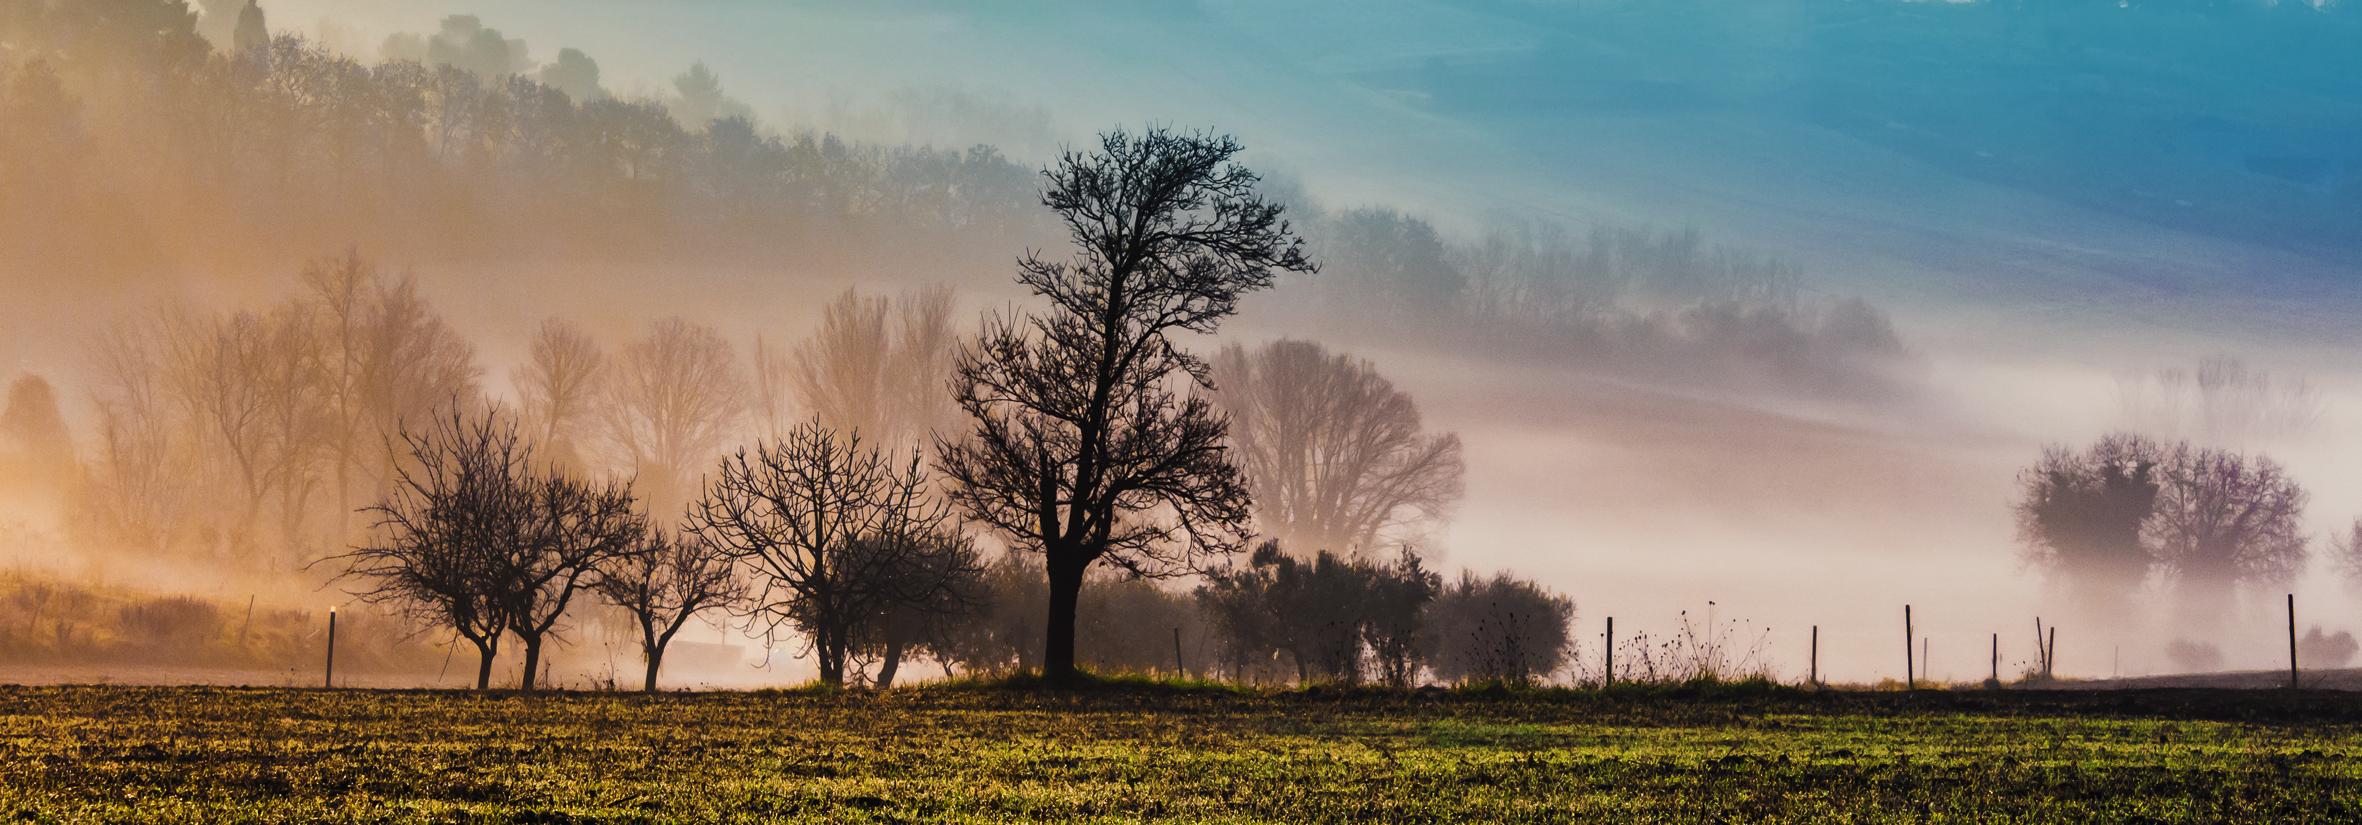 la mattina, in campagna...